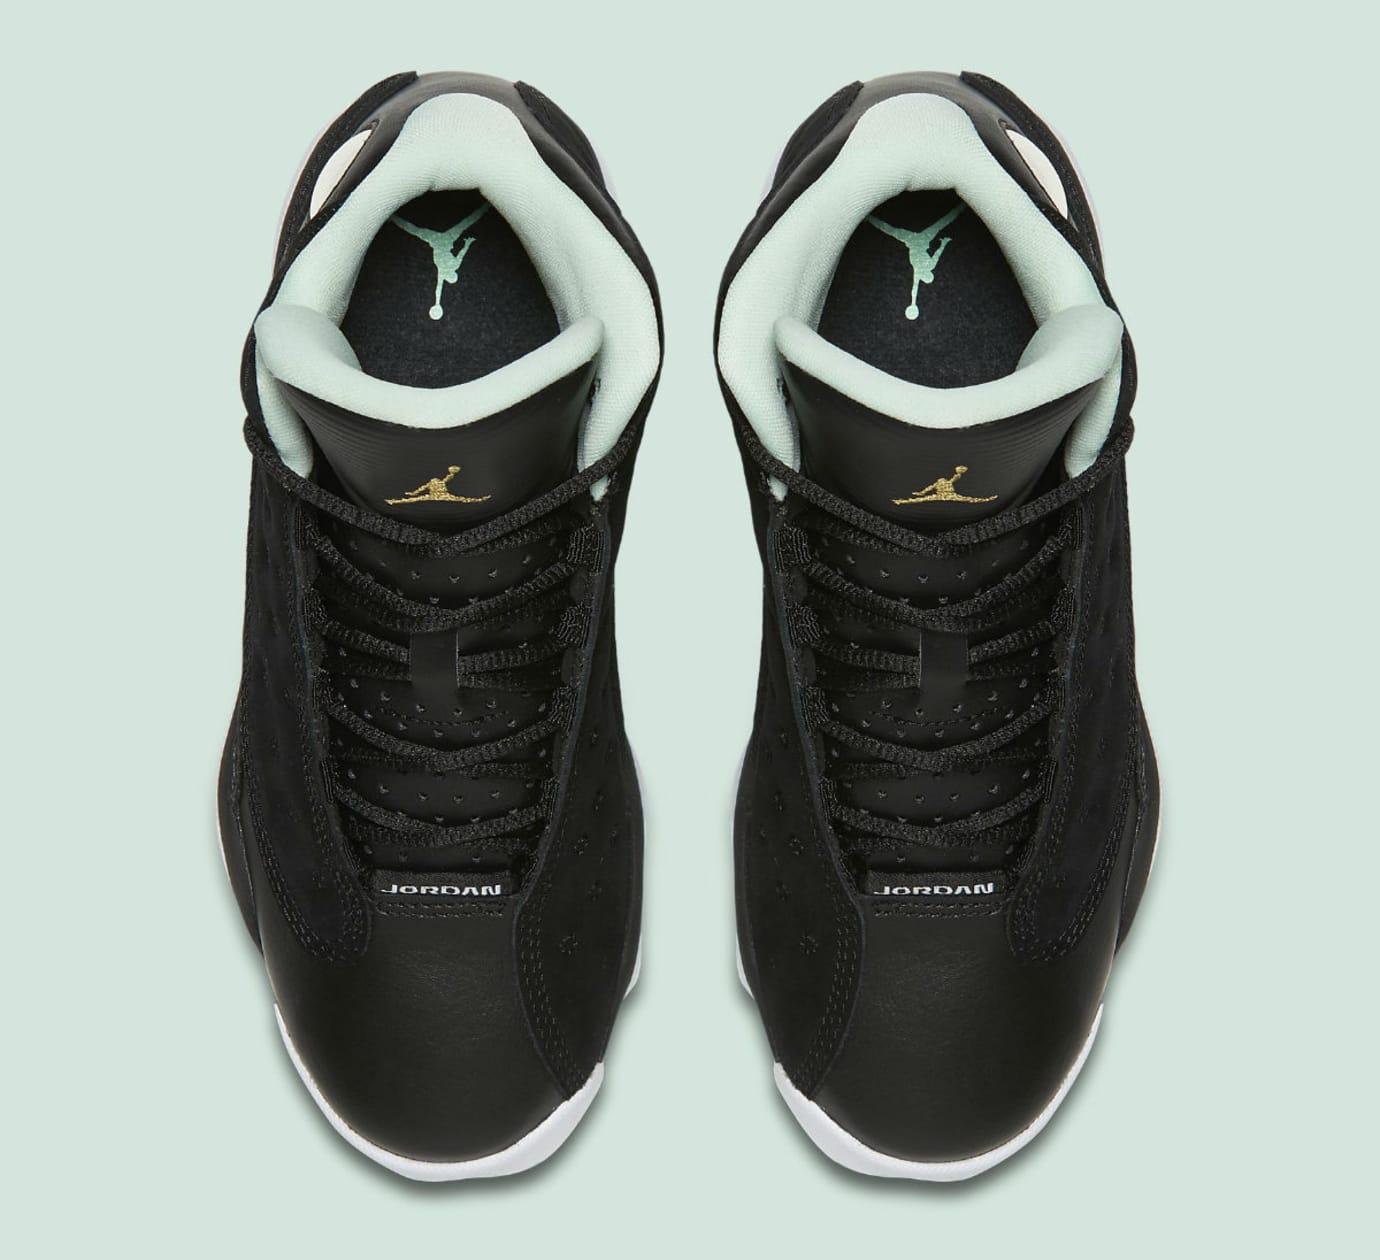 sneakers for cheap 33076 fba72 Air Jordan 13 Mint Foam Release Date Top 439358-015